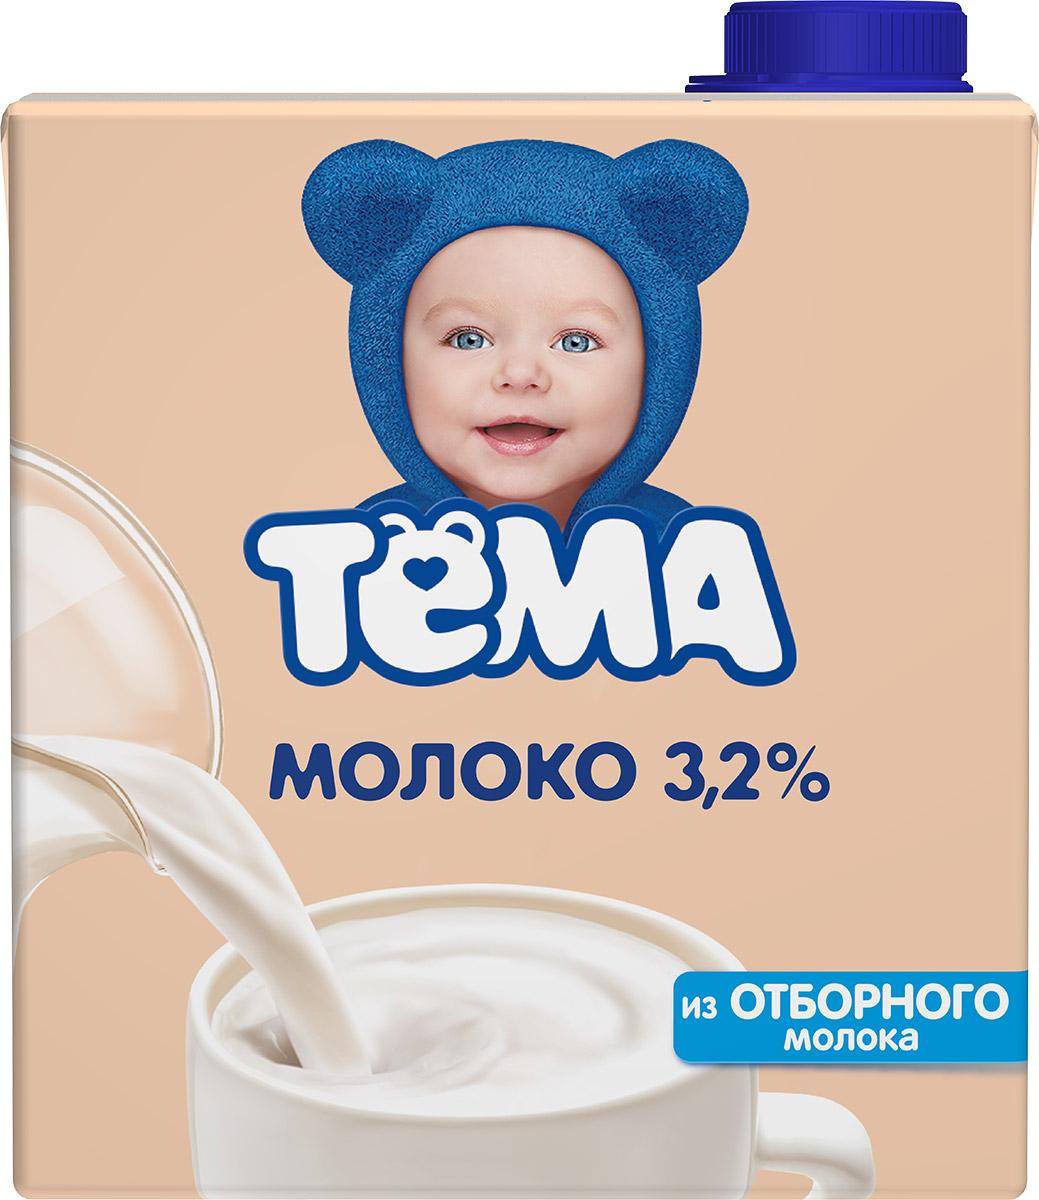 Тема Молоко 3,2%, 500 мл тема молоко 3 2% 500 мл